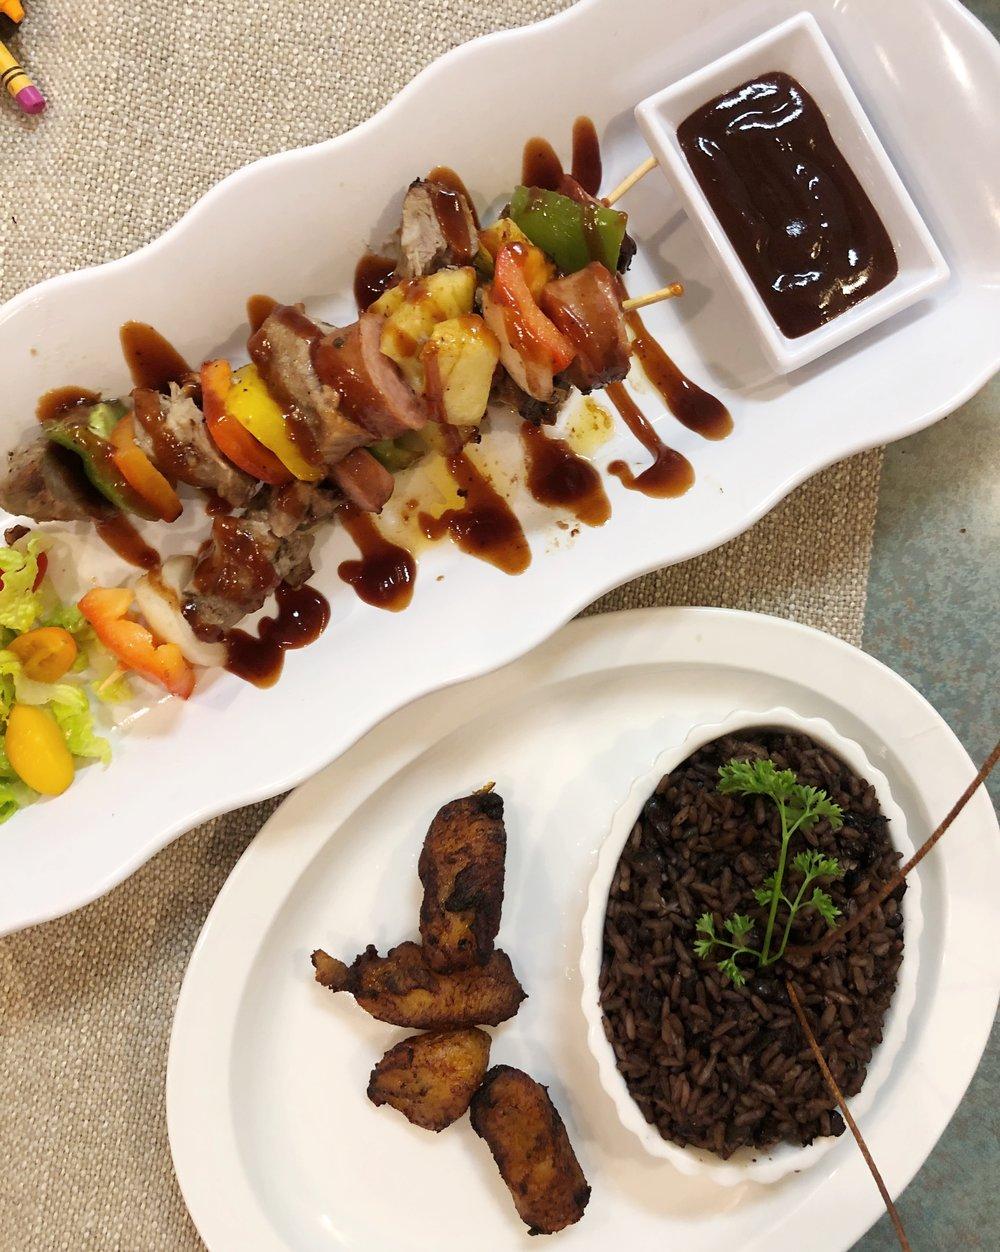 Caribbean-pork-Skewers-Brochetas-del-Caribe-havana-carolina-concord-nc